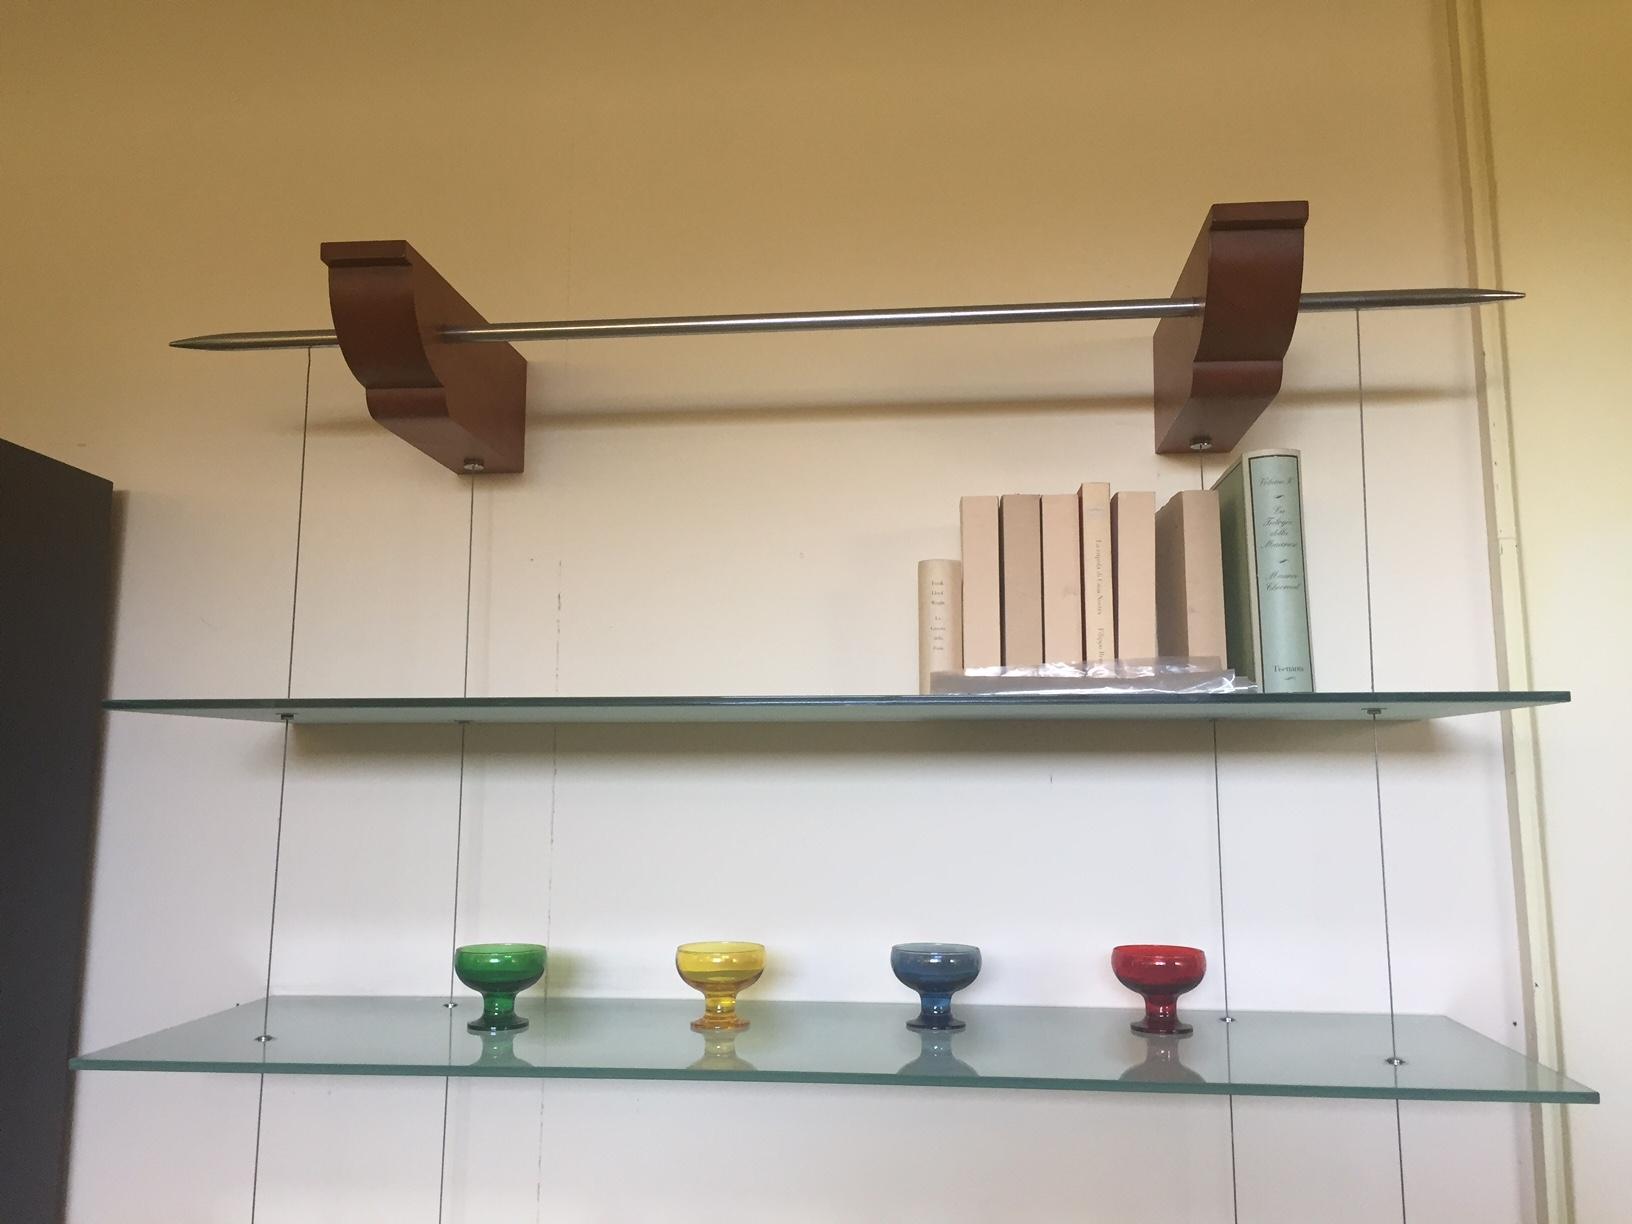 Libreria cattelan italia in vetro sospesa complementi a for Cattelan italia